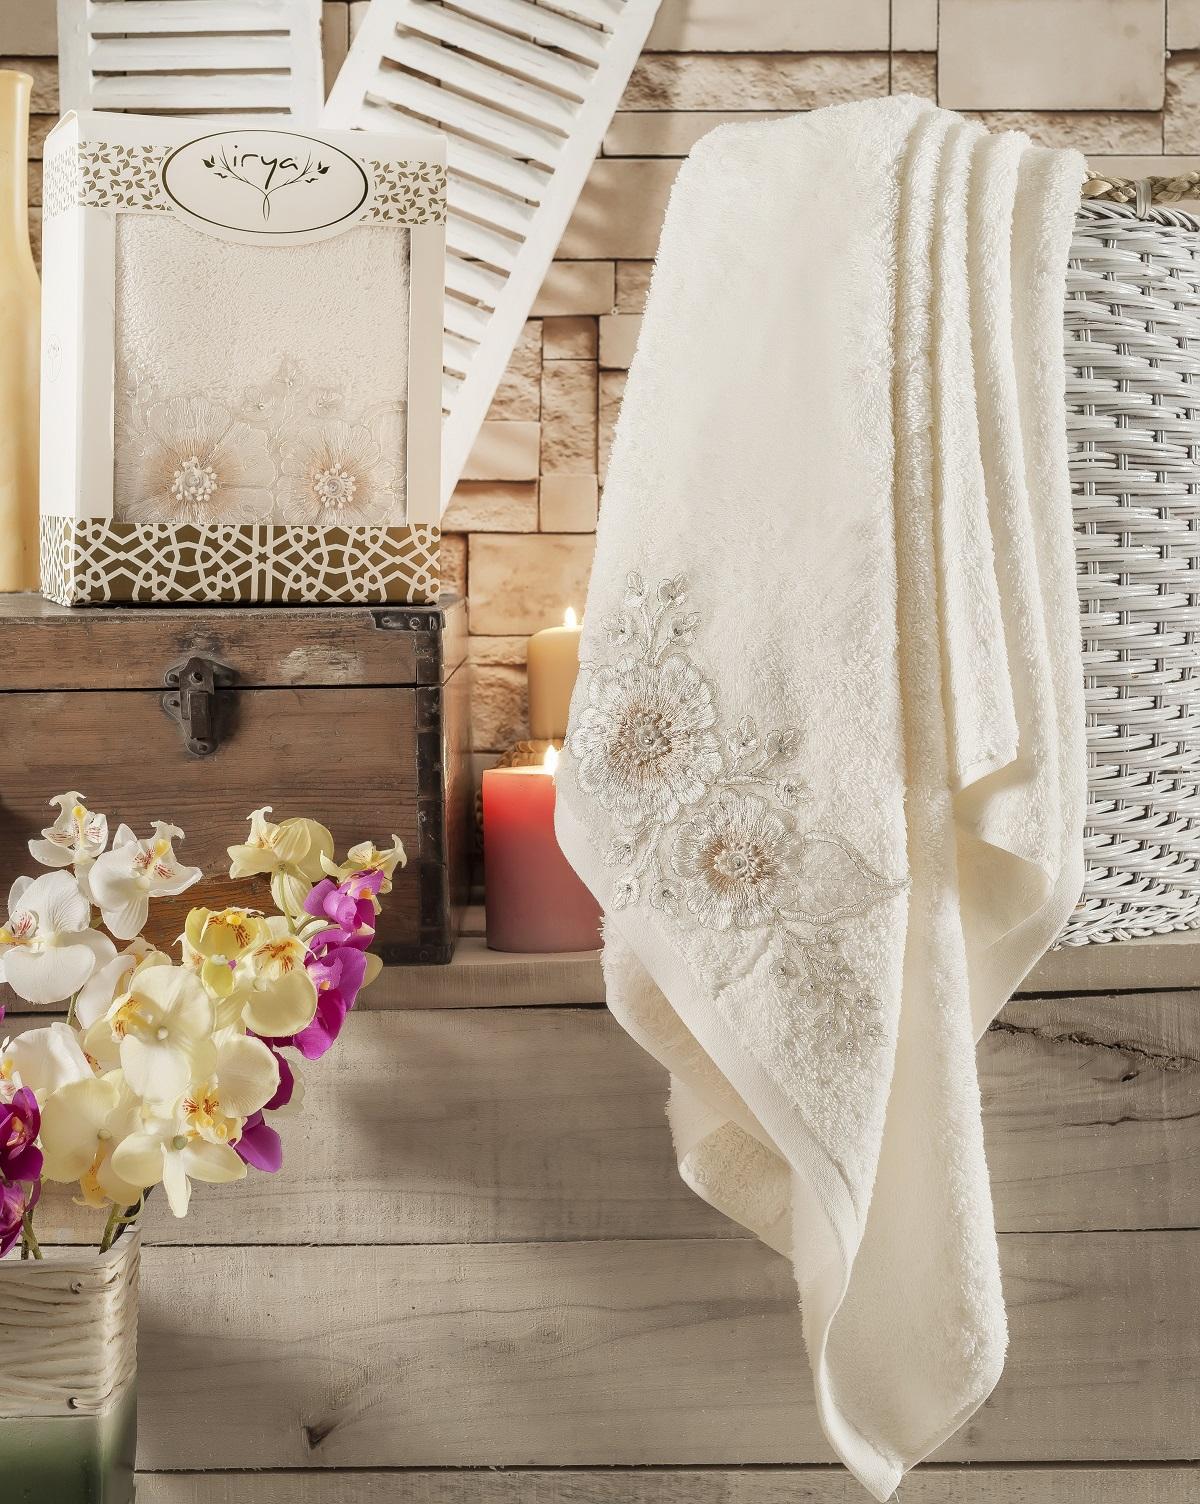 Купить Полотенца IRYA, Полотенце Fleur Цвет: Кремовый (85х150 см), Турция, Махра